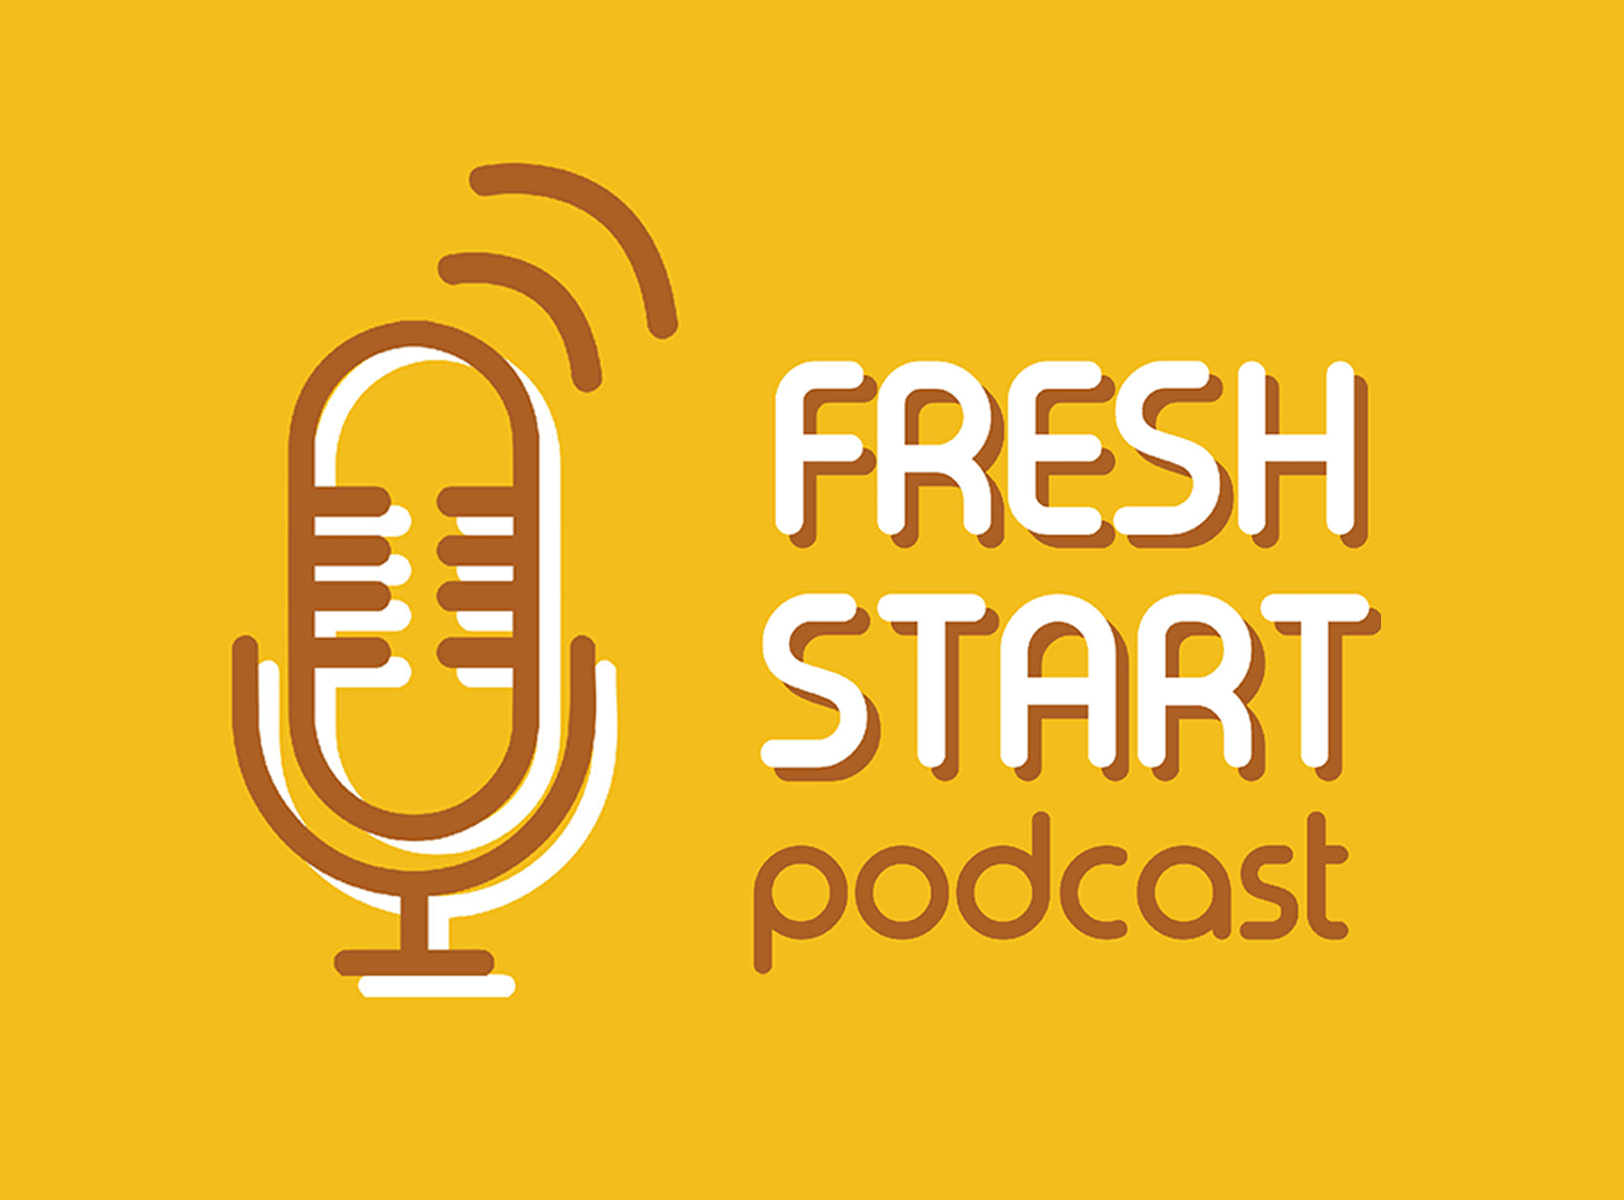 Fresh Start: Podcast News (1/23/2019 Wed.)